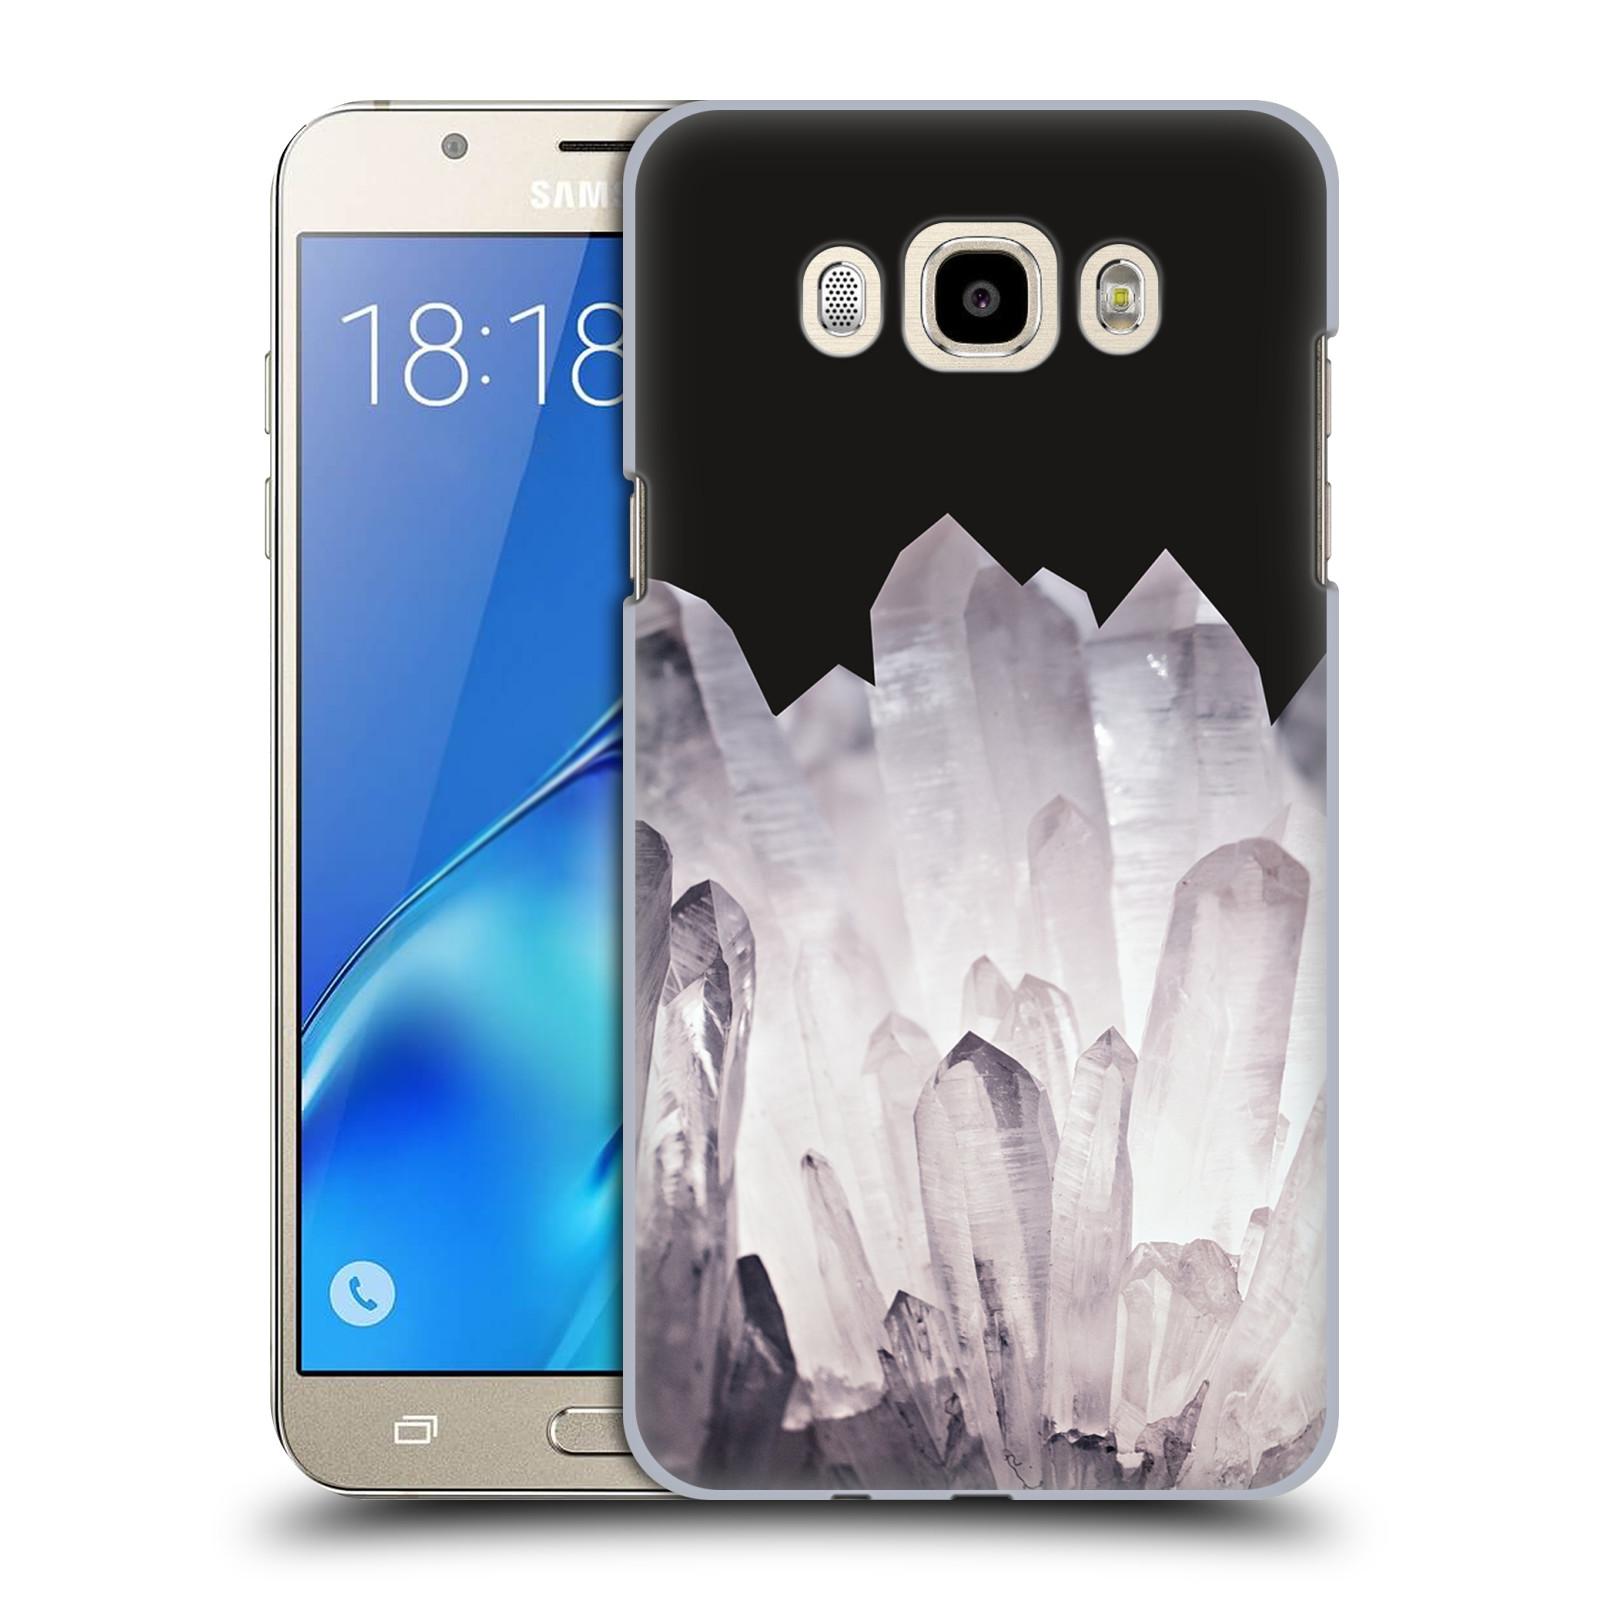 UFFICIALE-MONIKA-Strigel-PURO-Crystal-HARD-BACK-CASE-per-SAMSUNG-telefoni-3